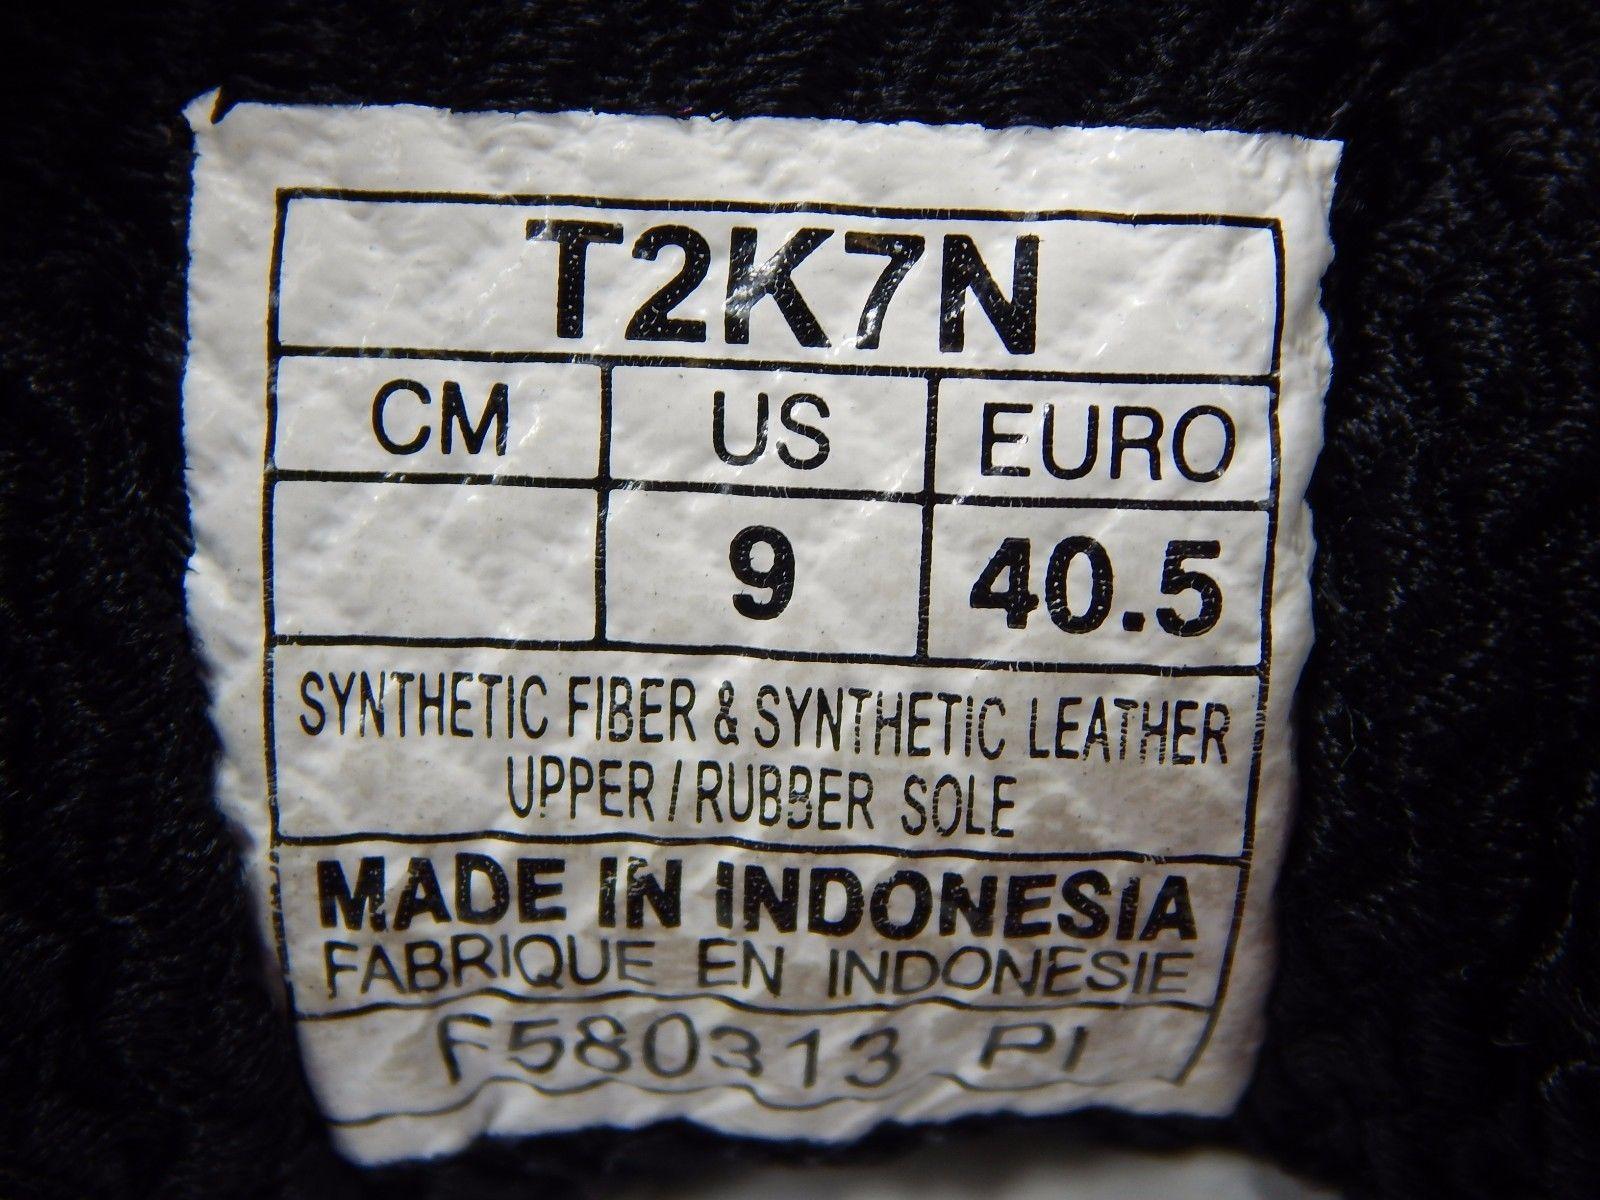 Asics GT 2000 Women's Running Shoes Size US 9 M (B) EU 40.5 Black Pink T2K7N